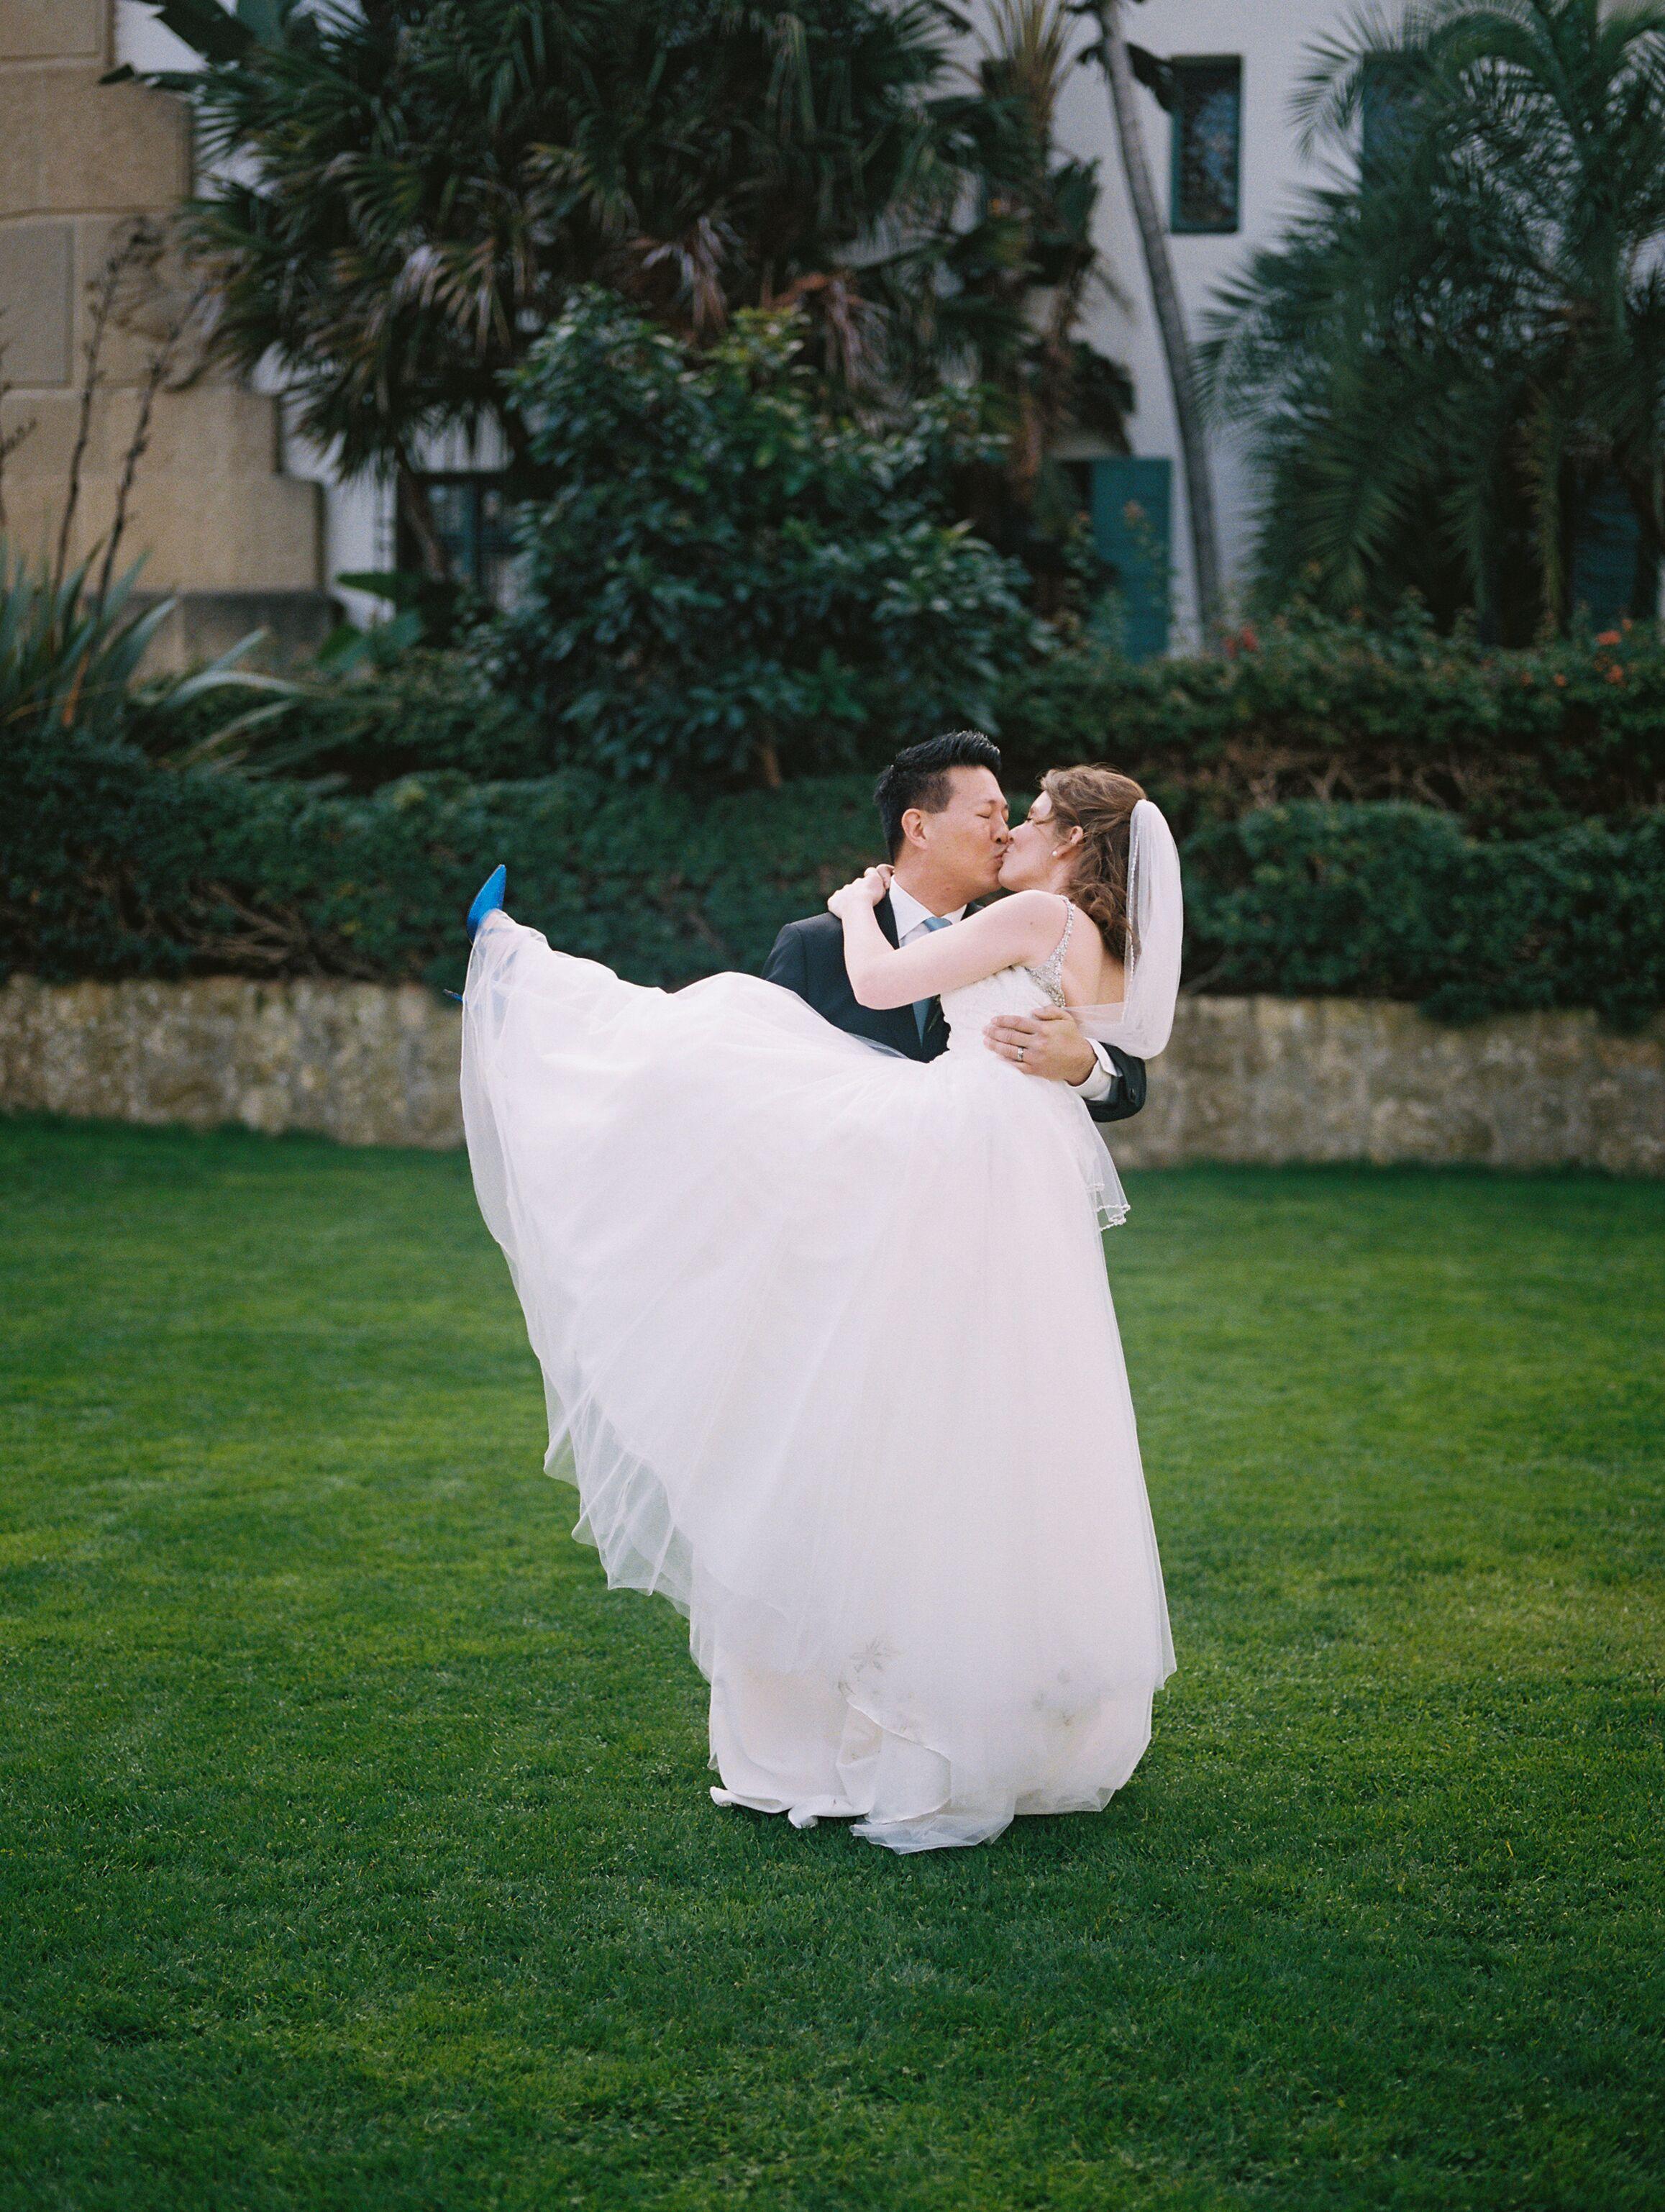 www.santabarbawedding.com | Venue: Santa Barbara Courthouse | Photography: Ryanne Bee Photography | Officiant: Santa Barbara Classic Weddings | Bride and Groom Romantic Kiss